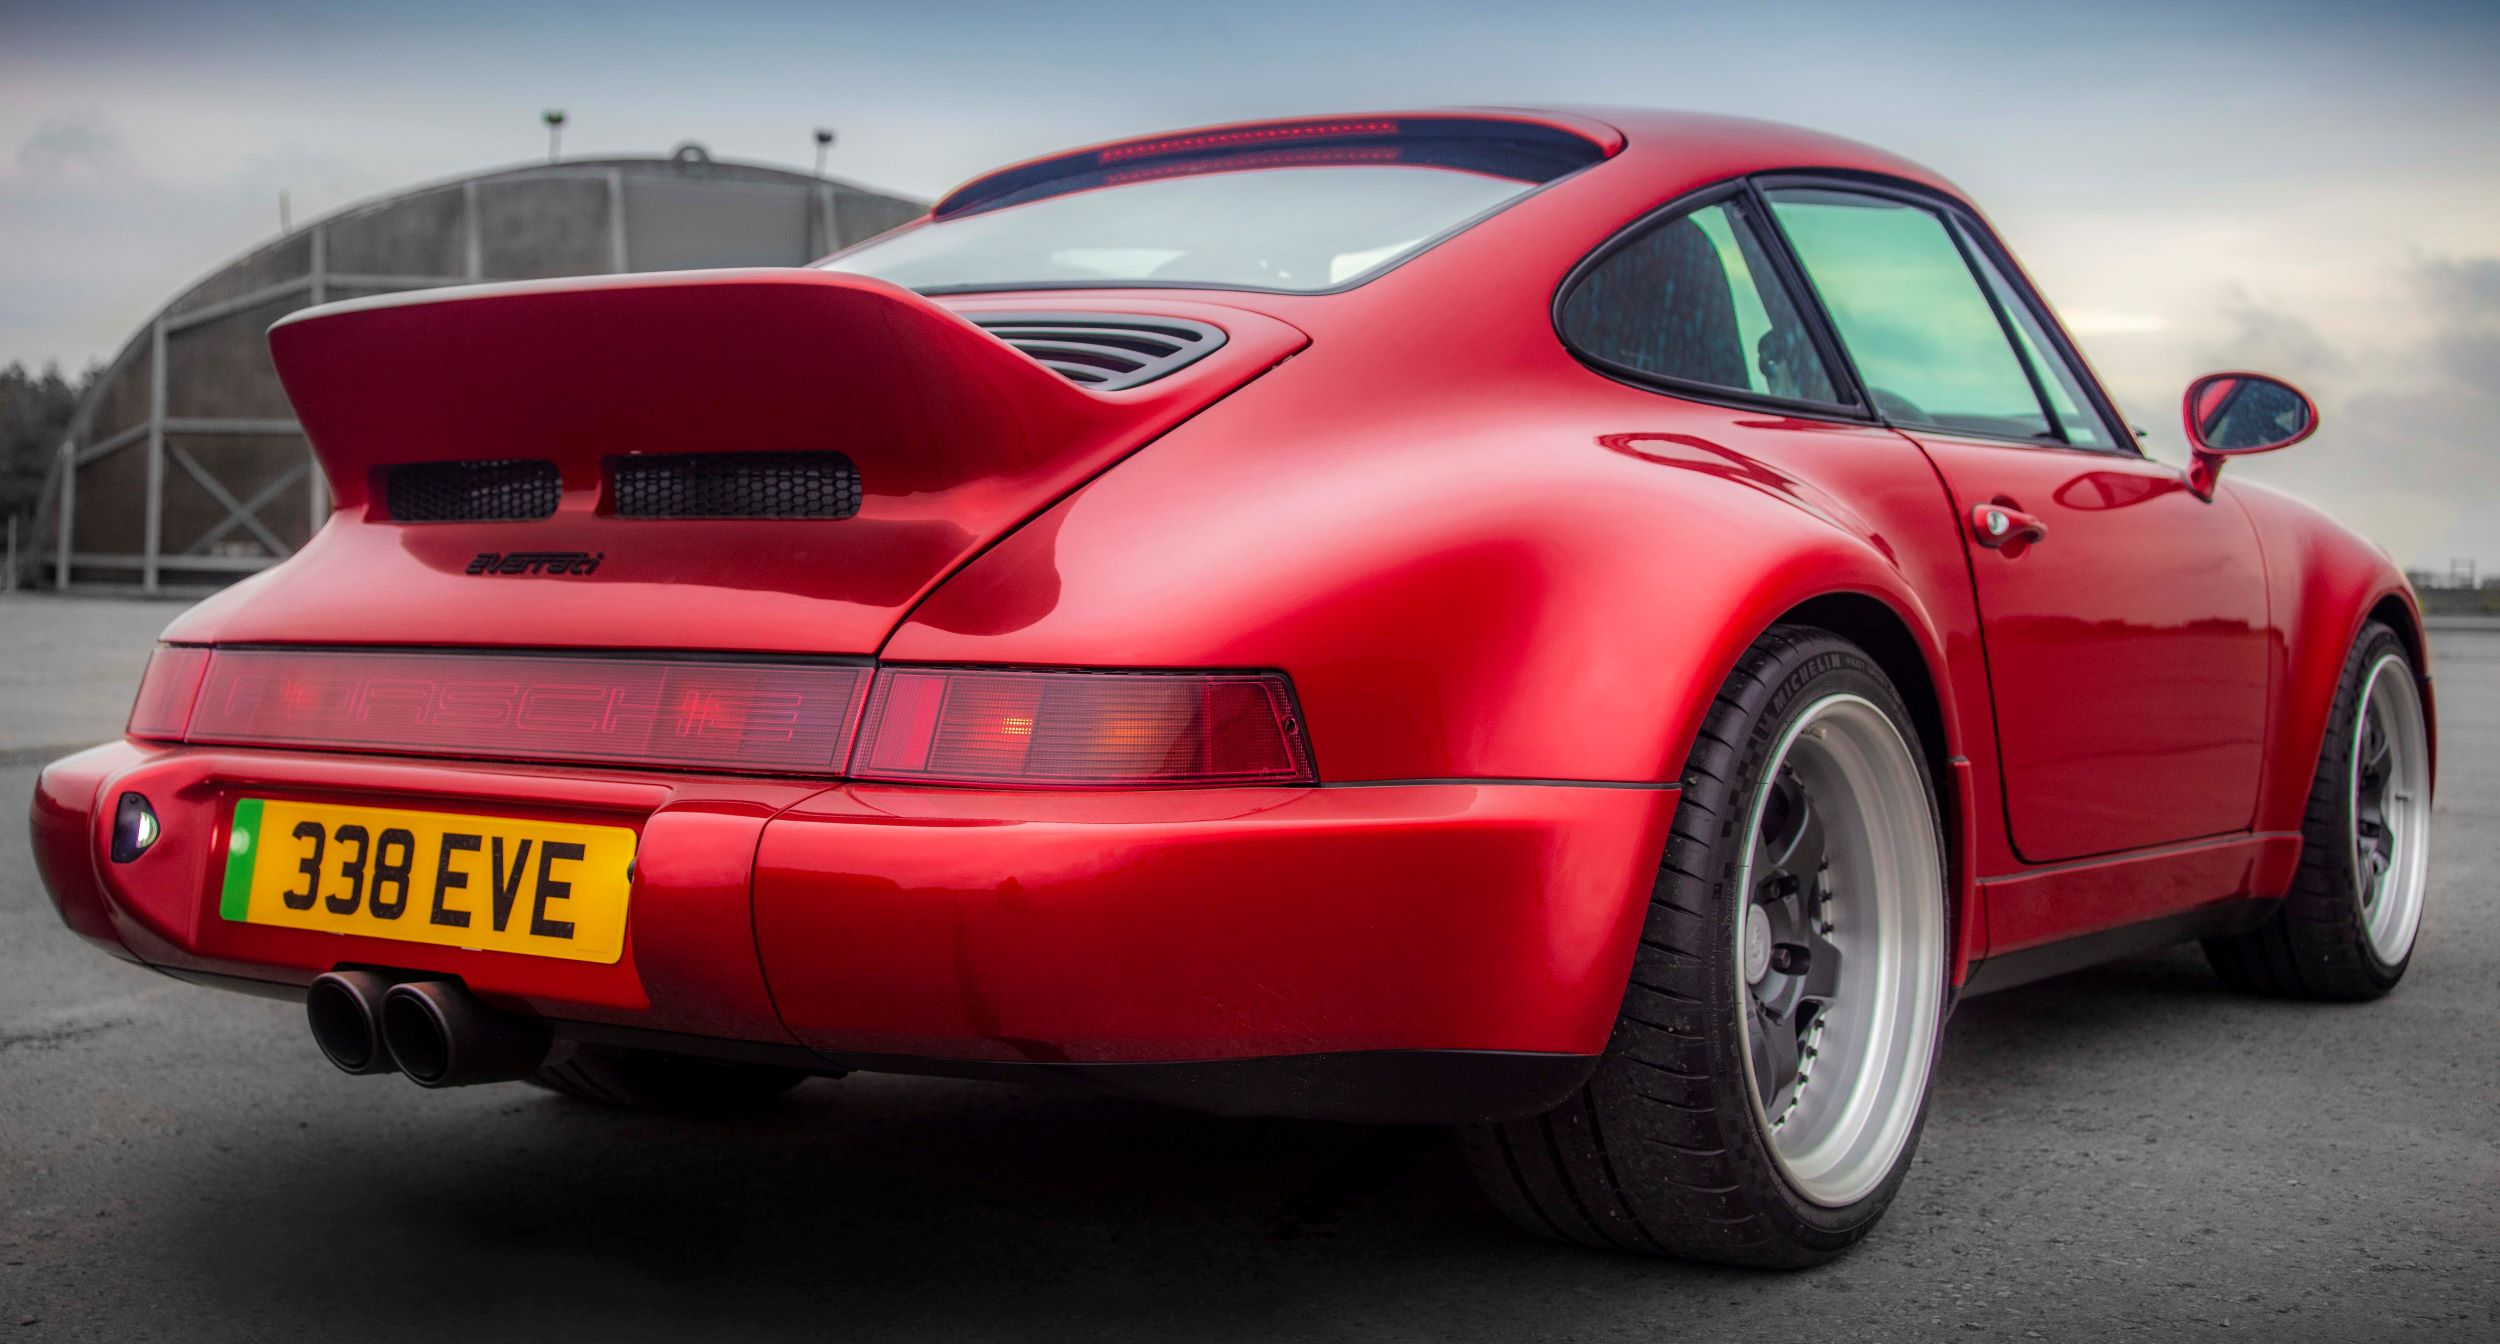 Porsche 911 Everrati tył